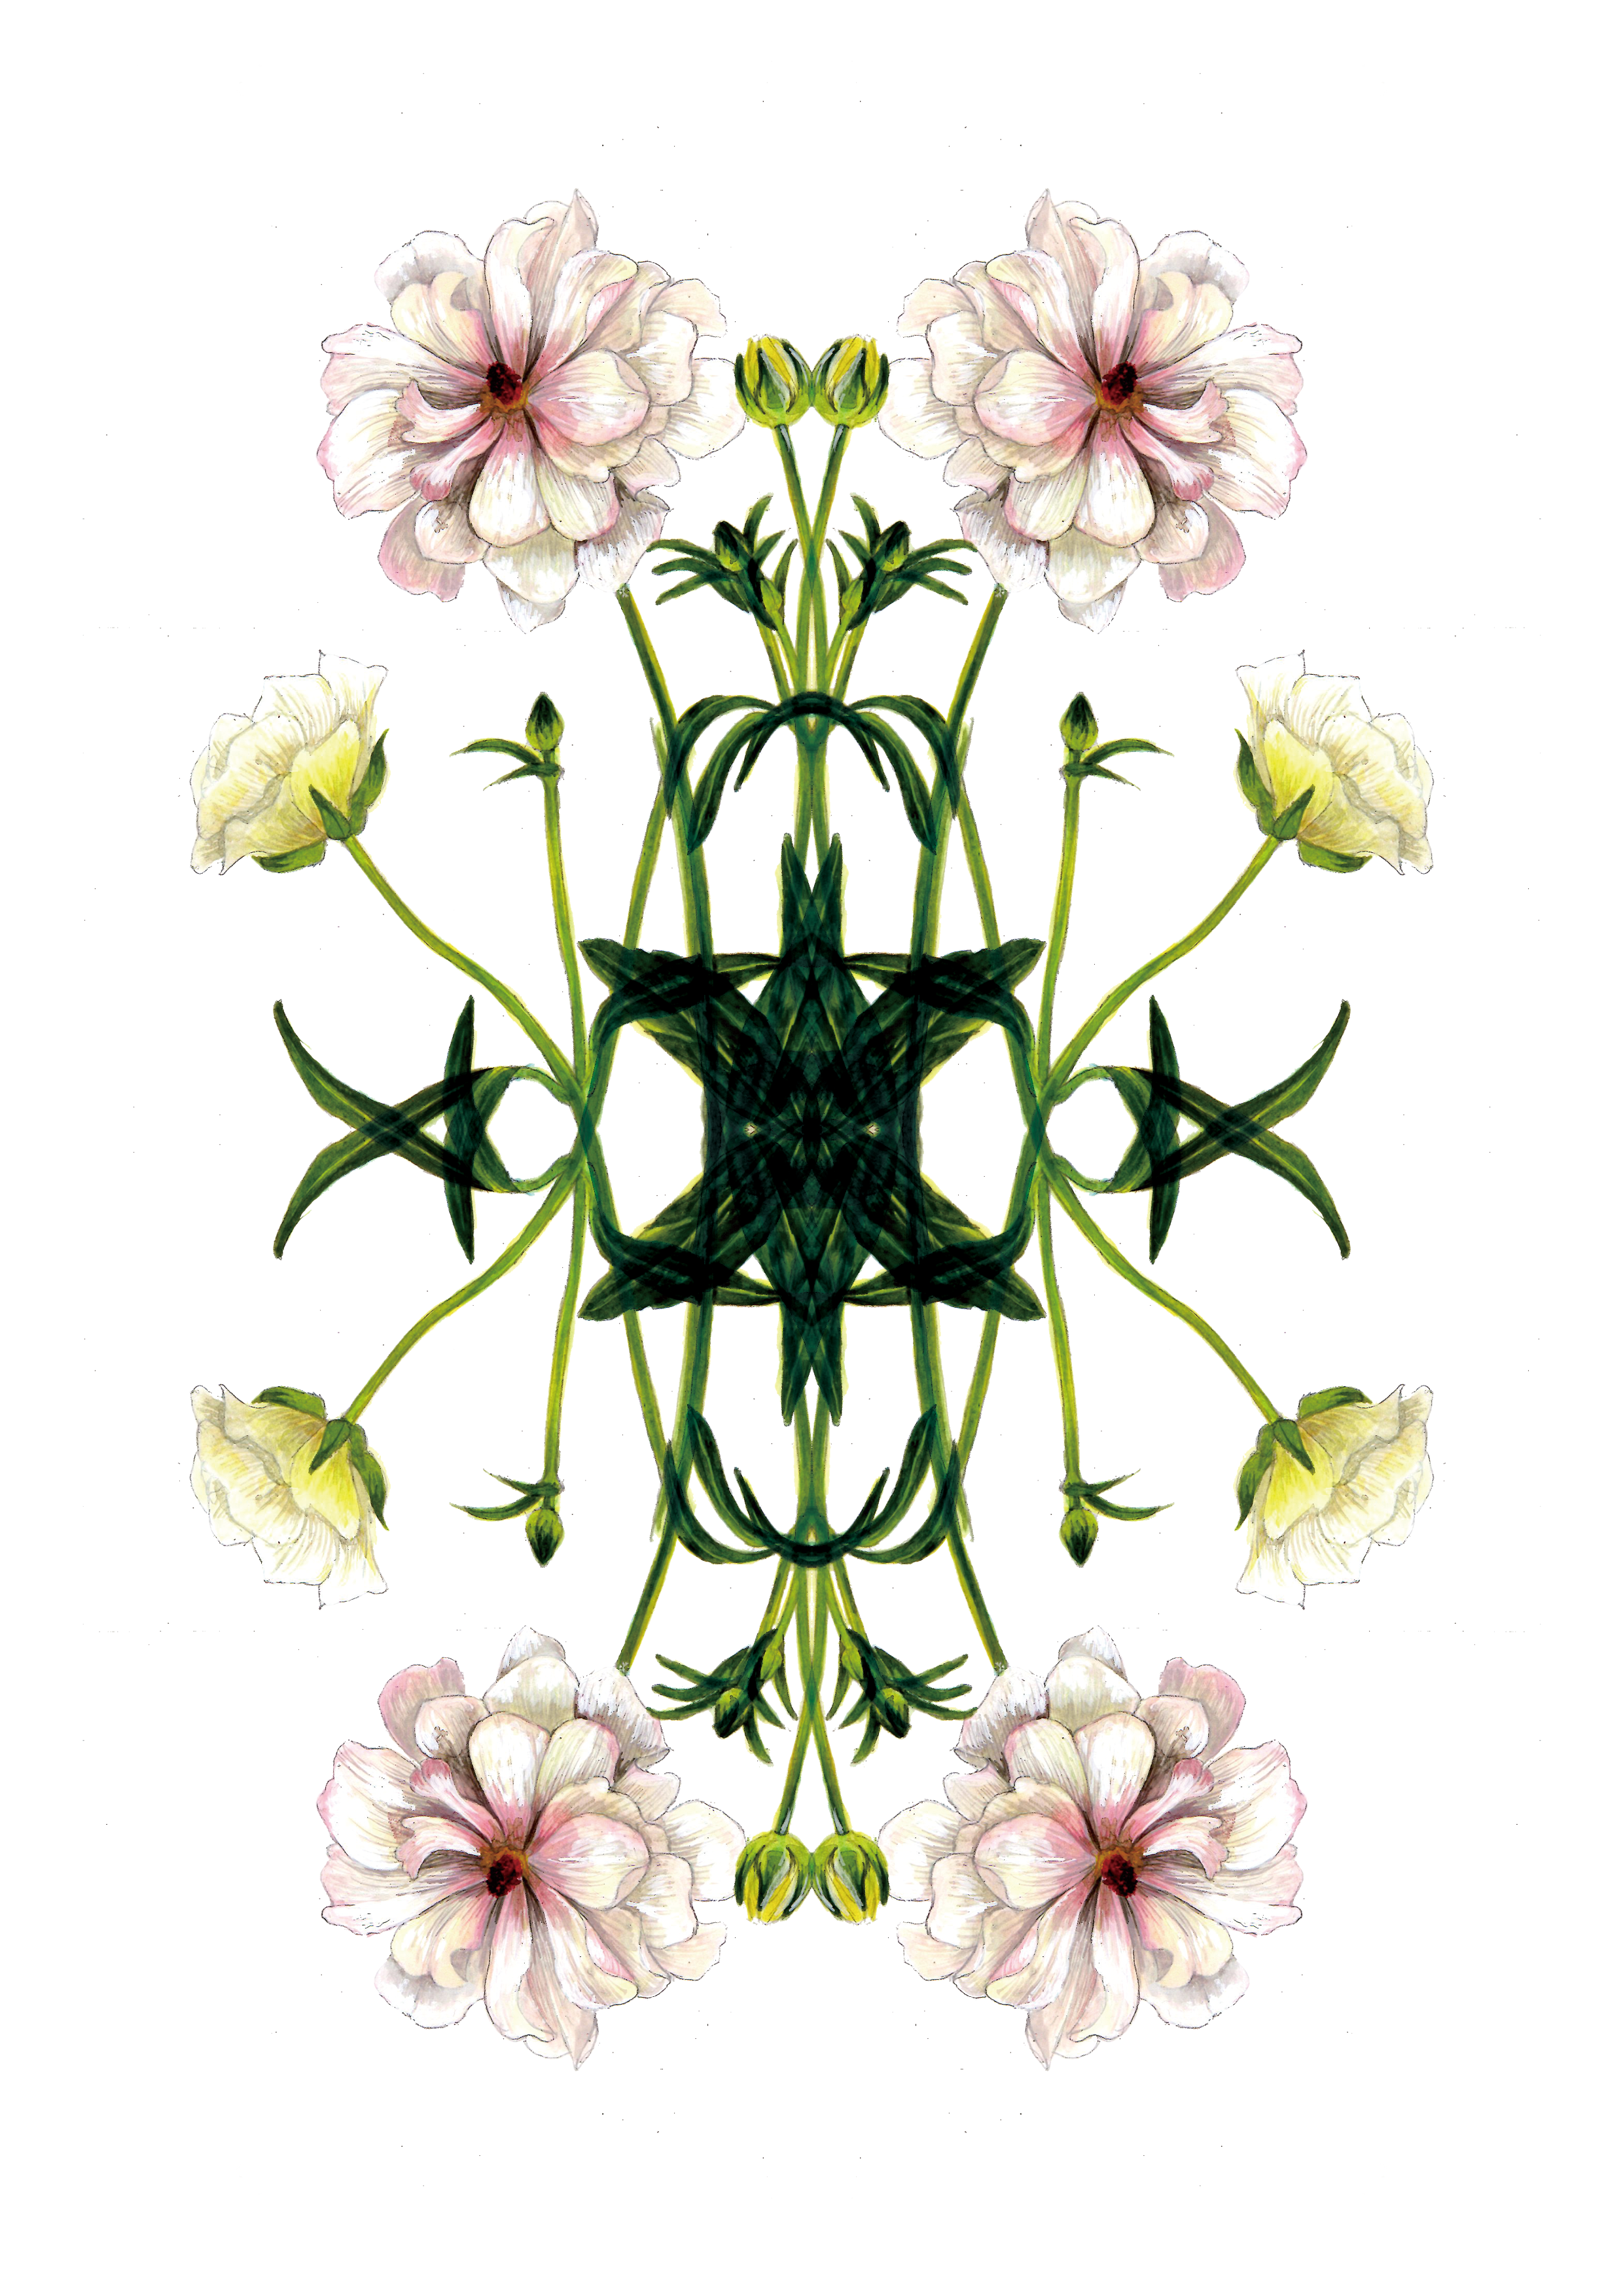 plants54